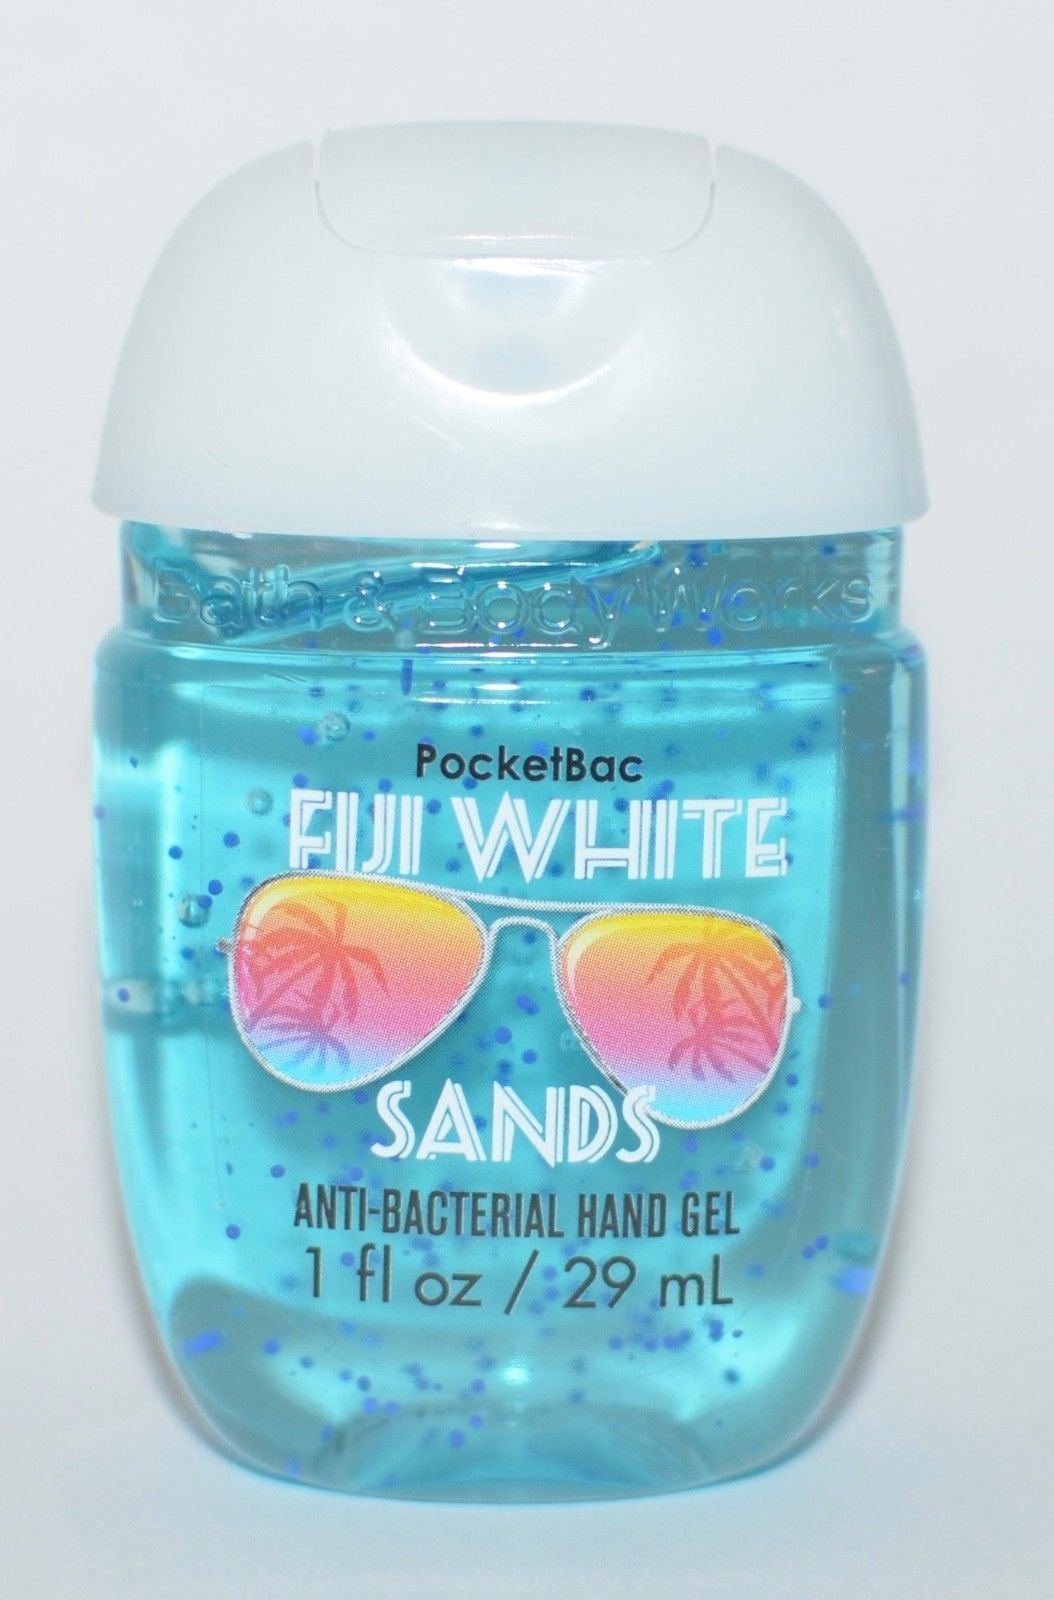 null - Bath & Body Works PocketBac Hand Gel Sanitizer Fiji White Sands